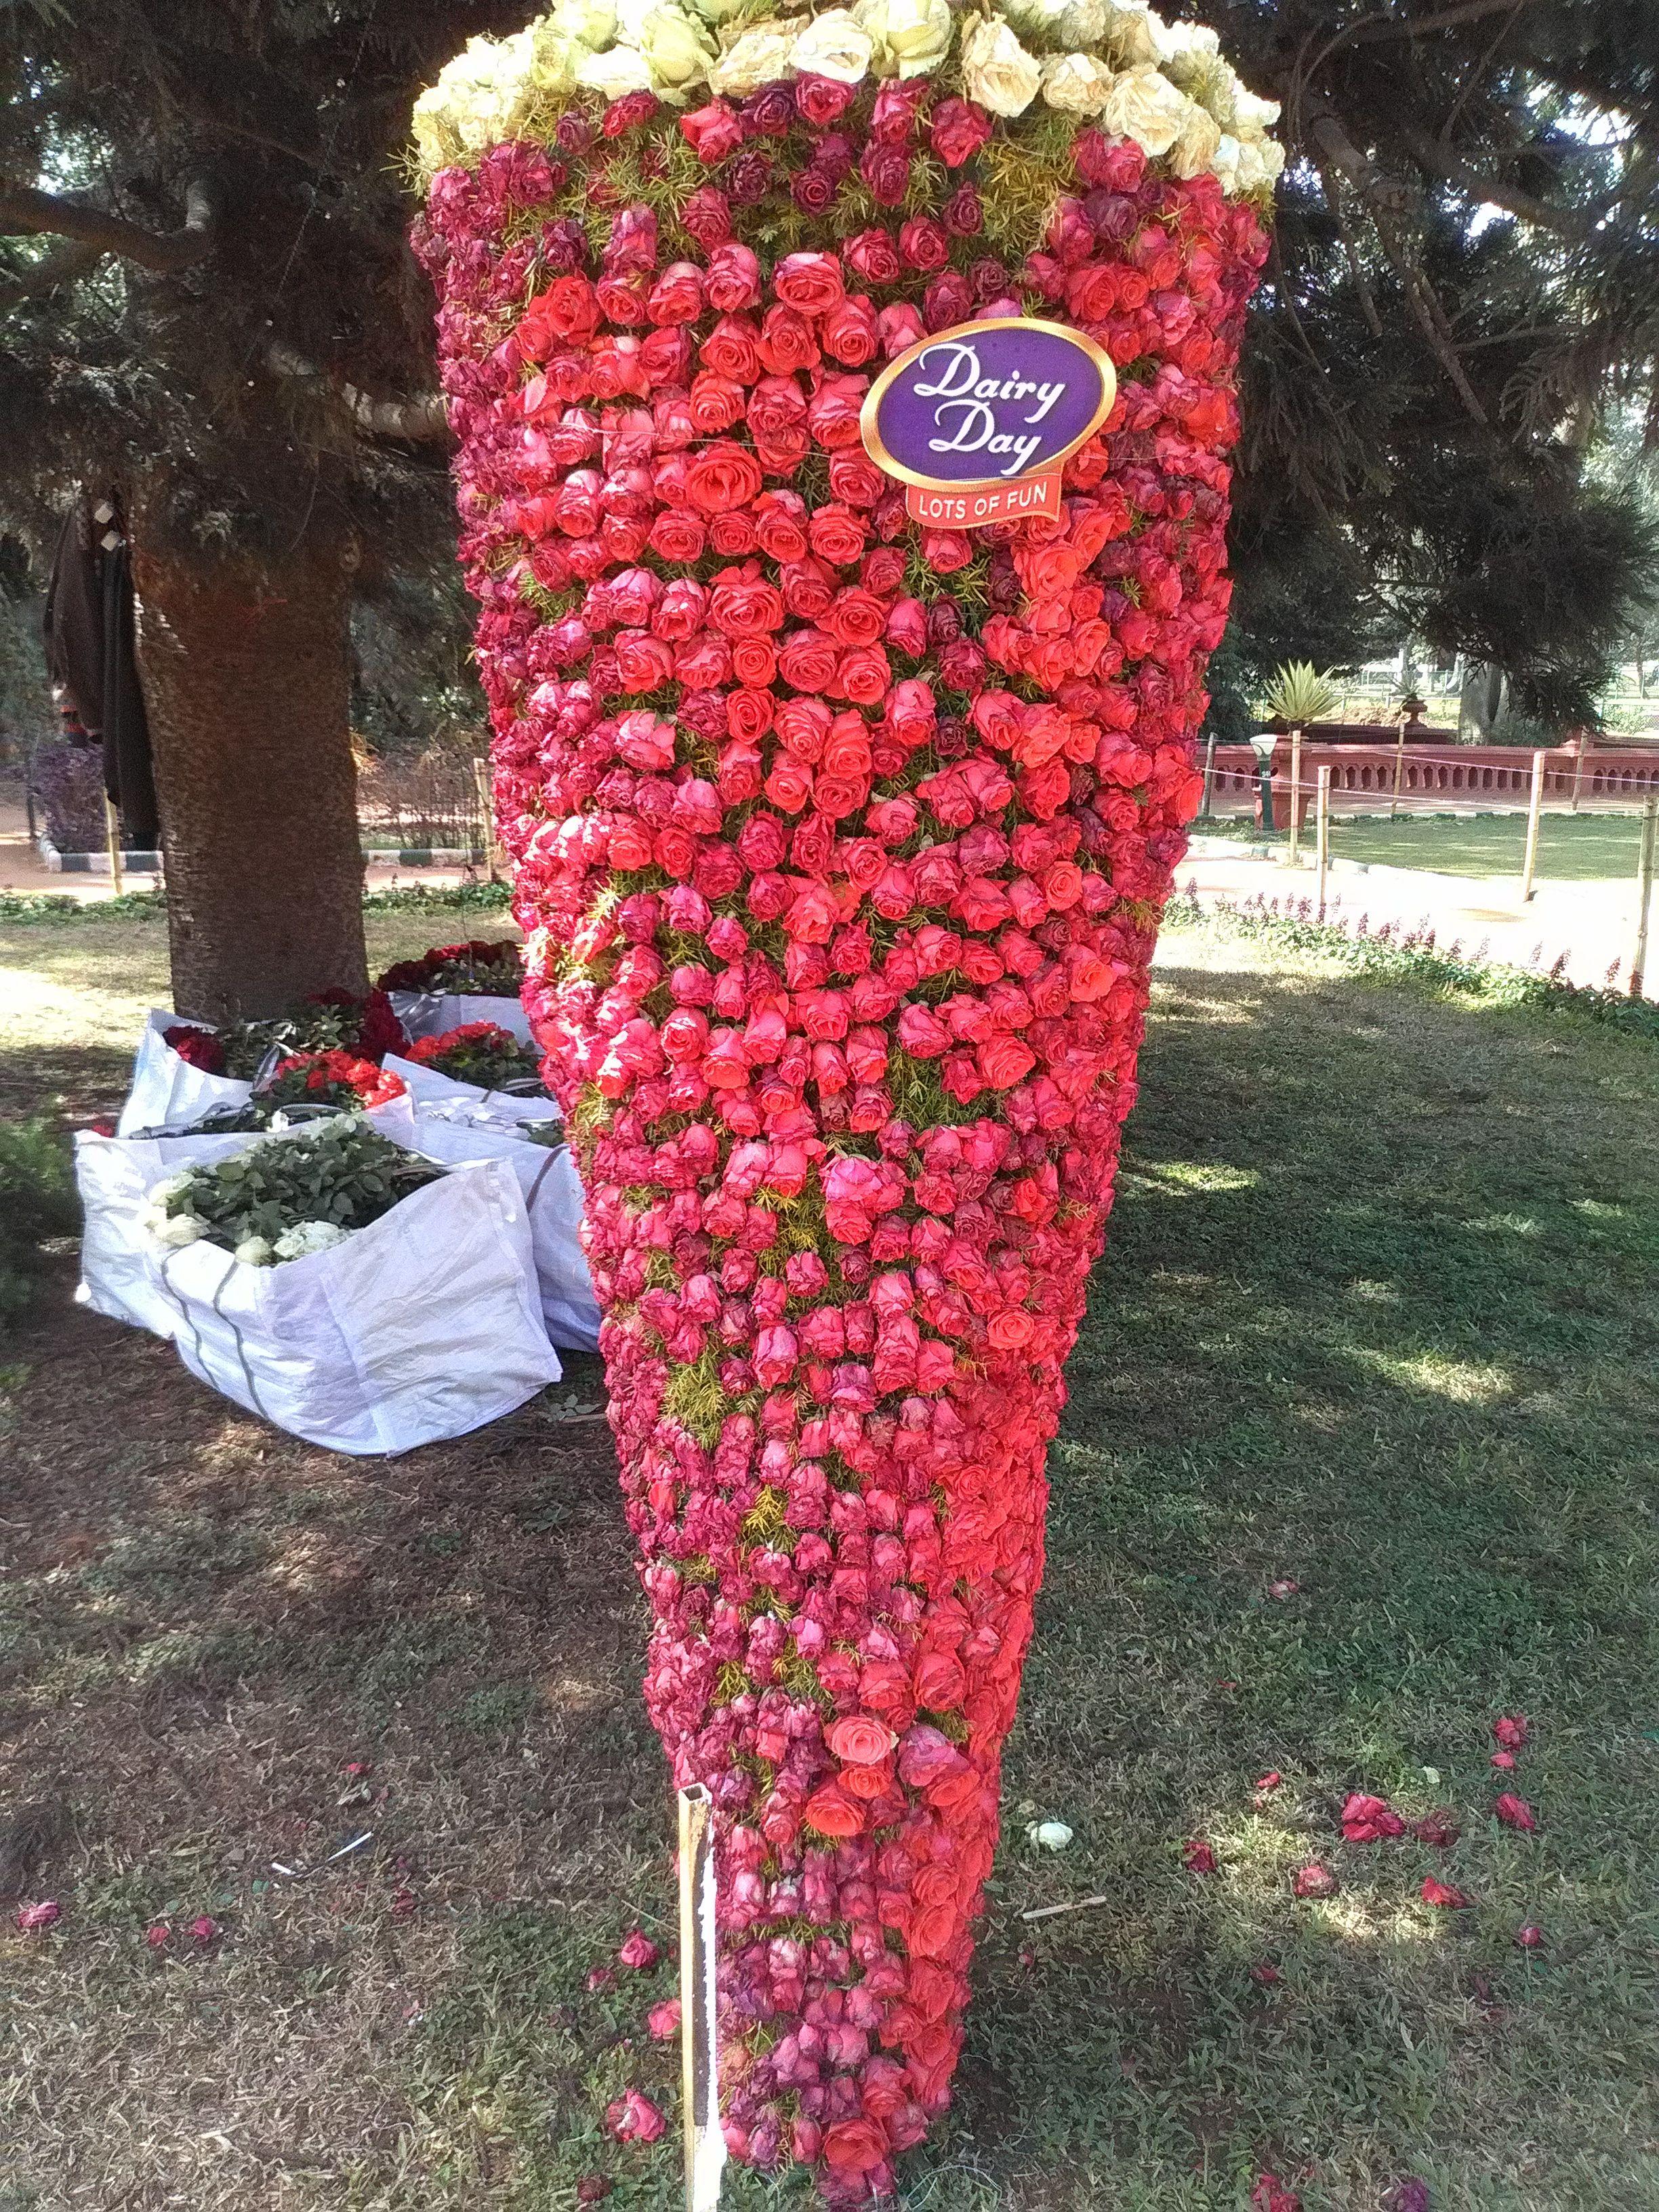 512fe697b9ad Flower Show at Lalbagh Botanical Gardens